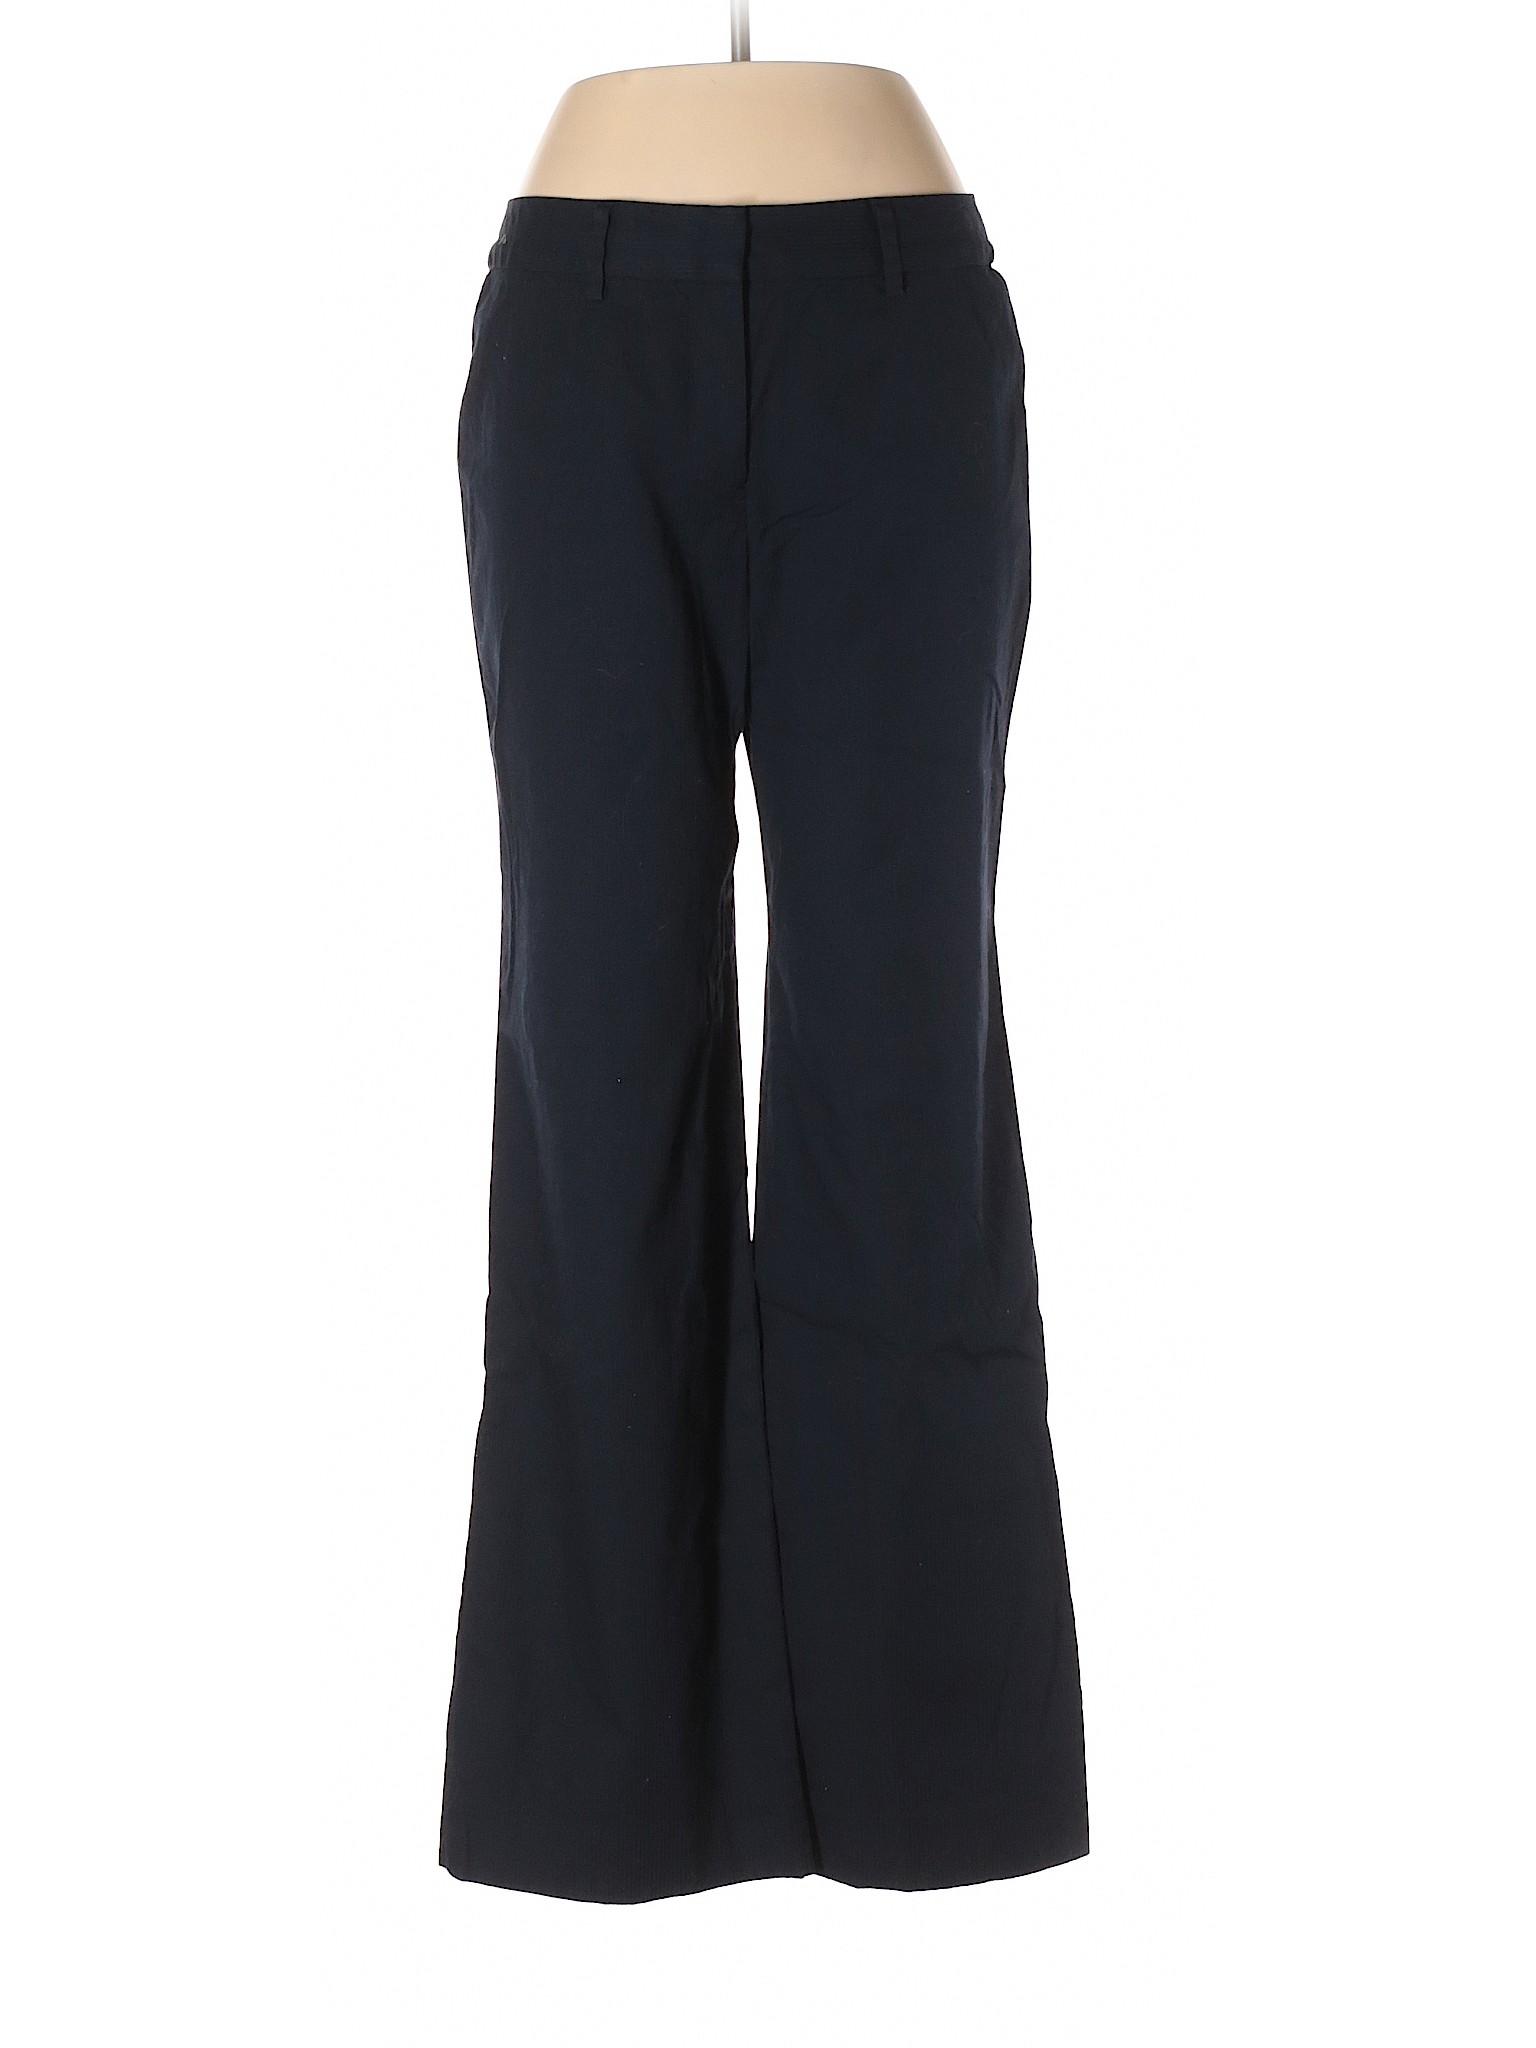 winter Isaac Dress Target Mizrahi for Pants Boutique dAwxqSPd